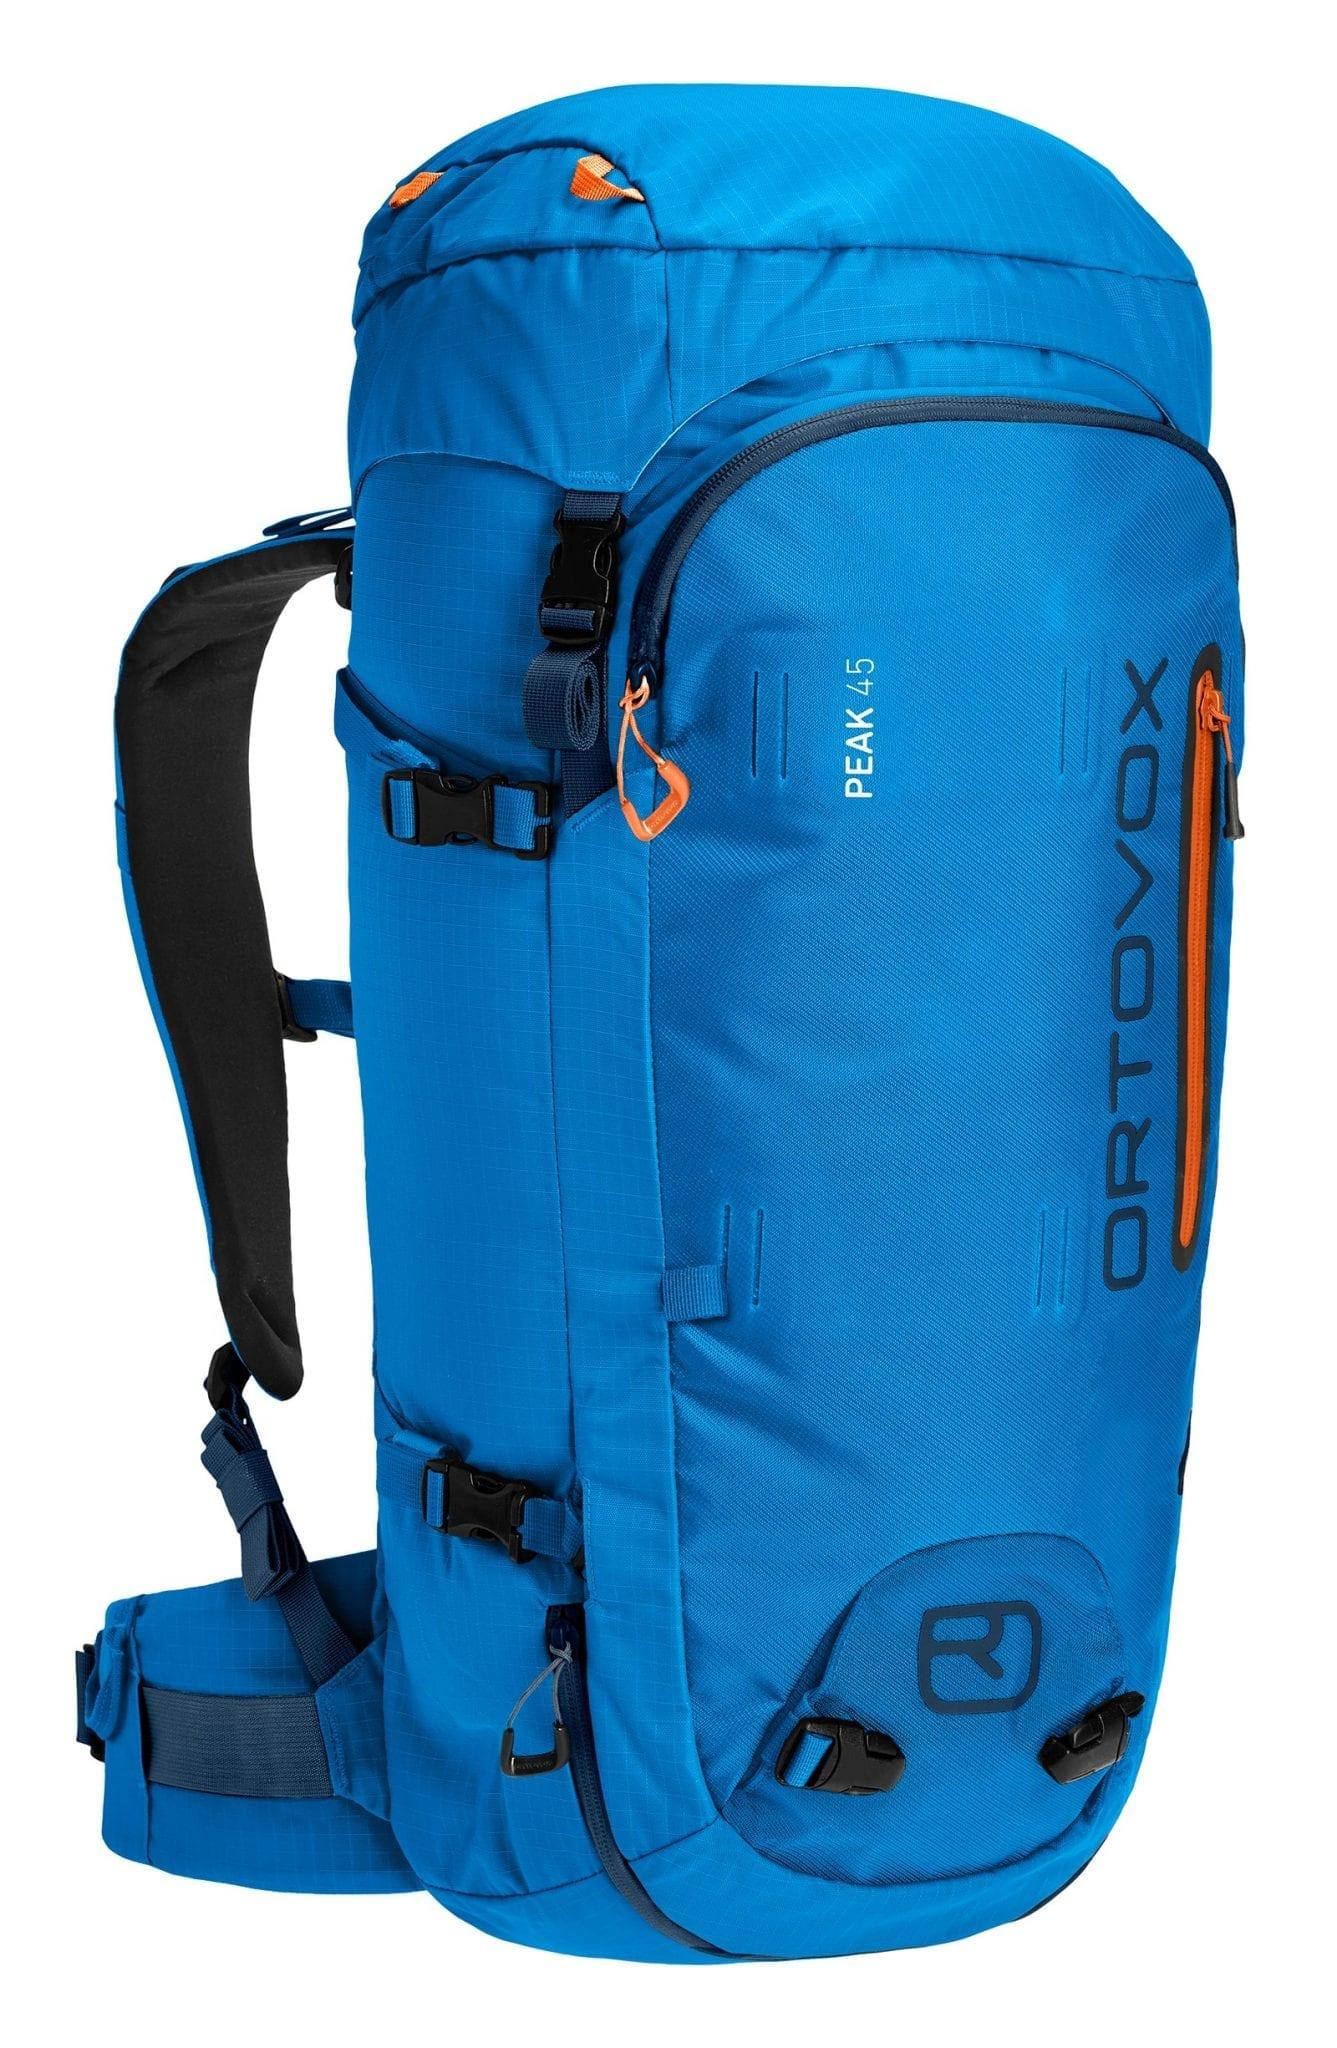 Ortovox Peak 45 - Safety Blue